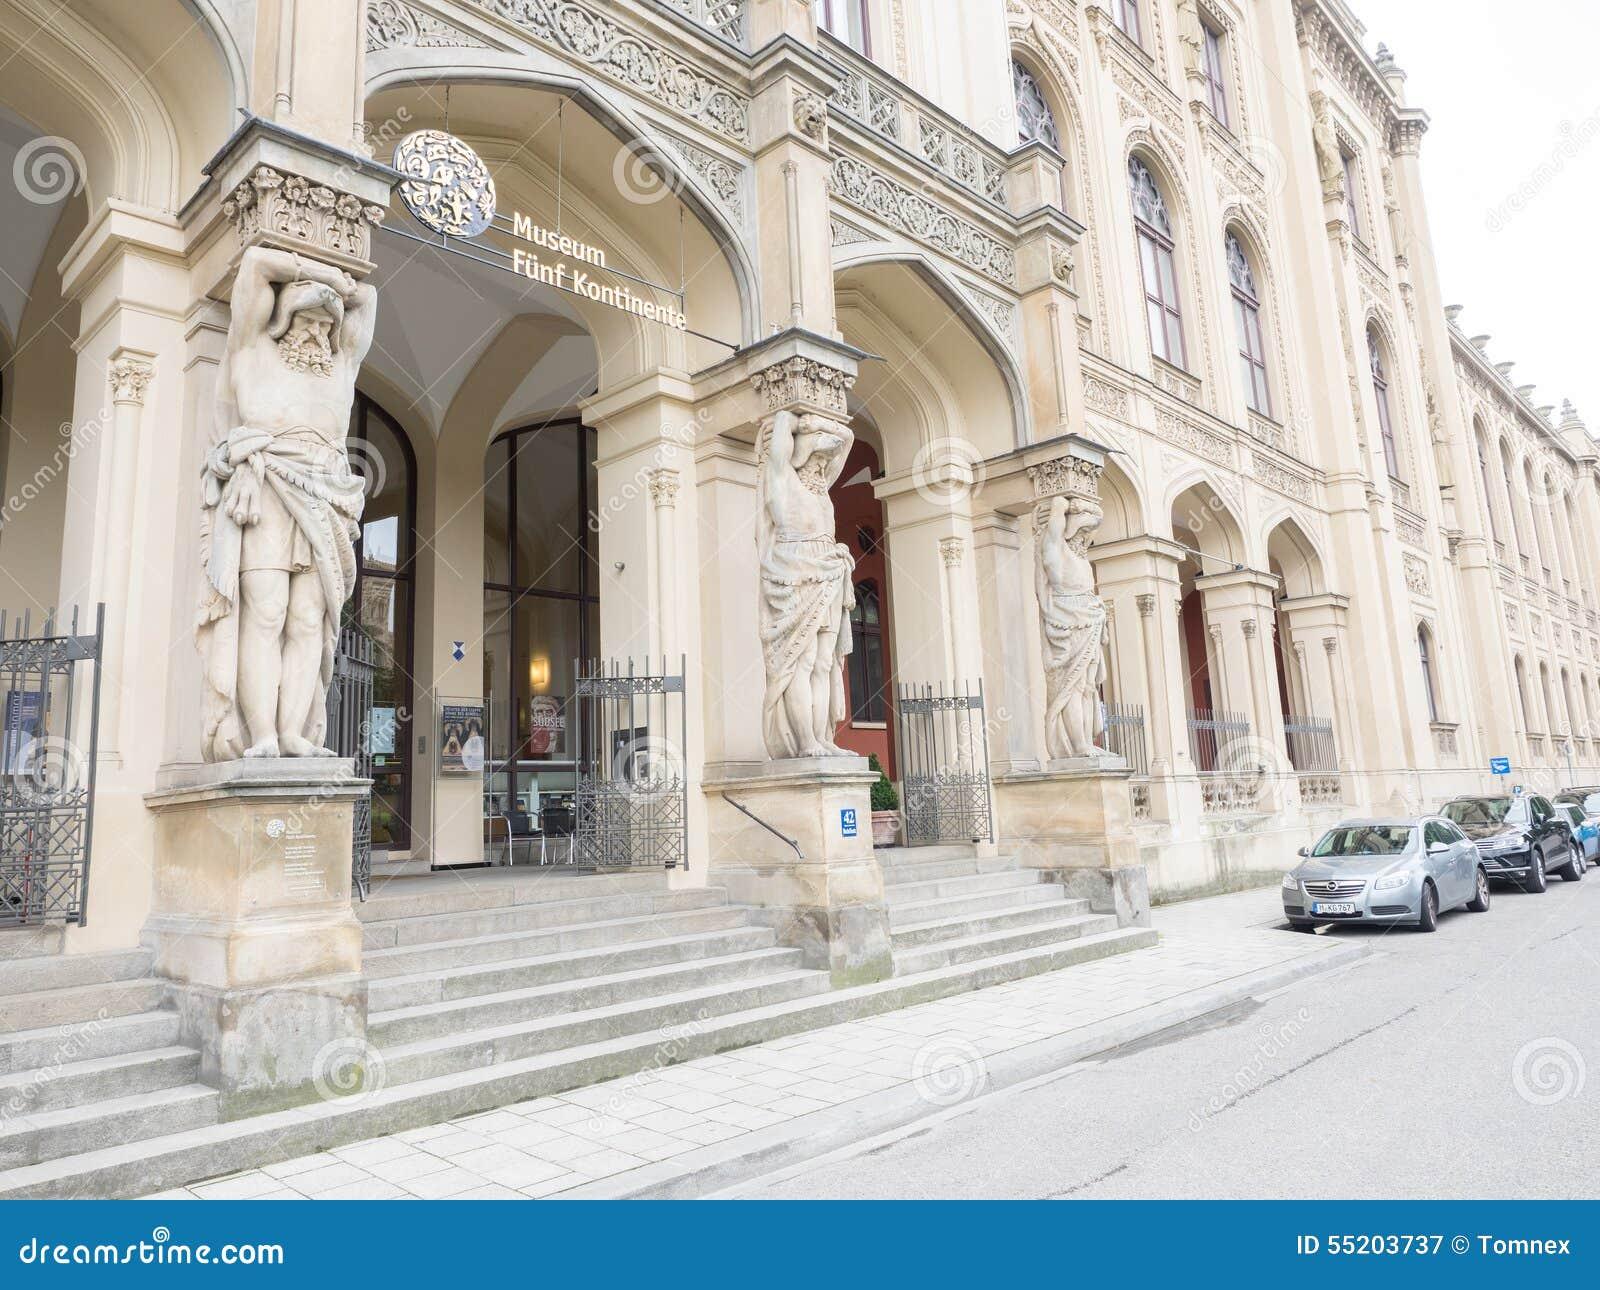 Kontinente München des Museums fünf